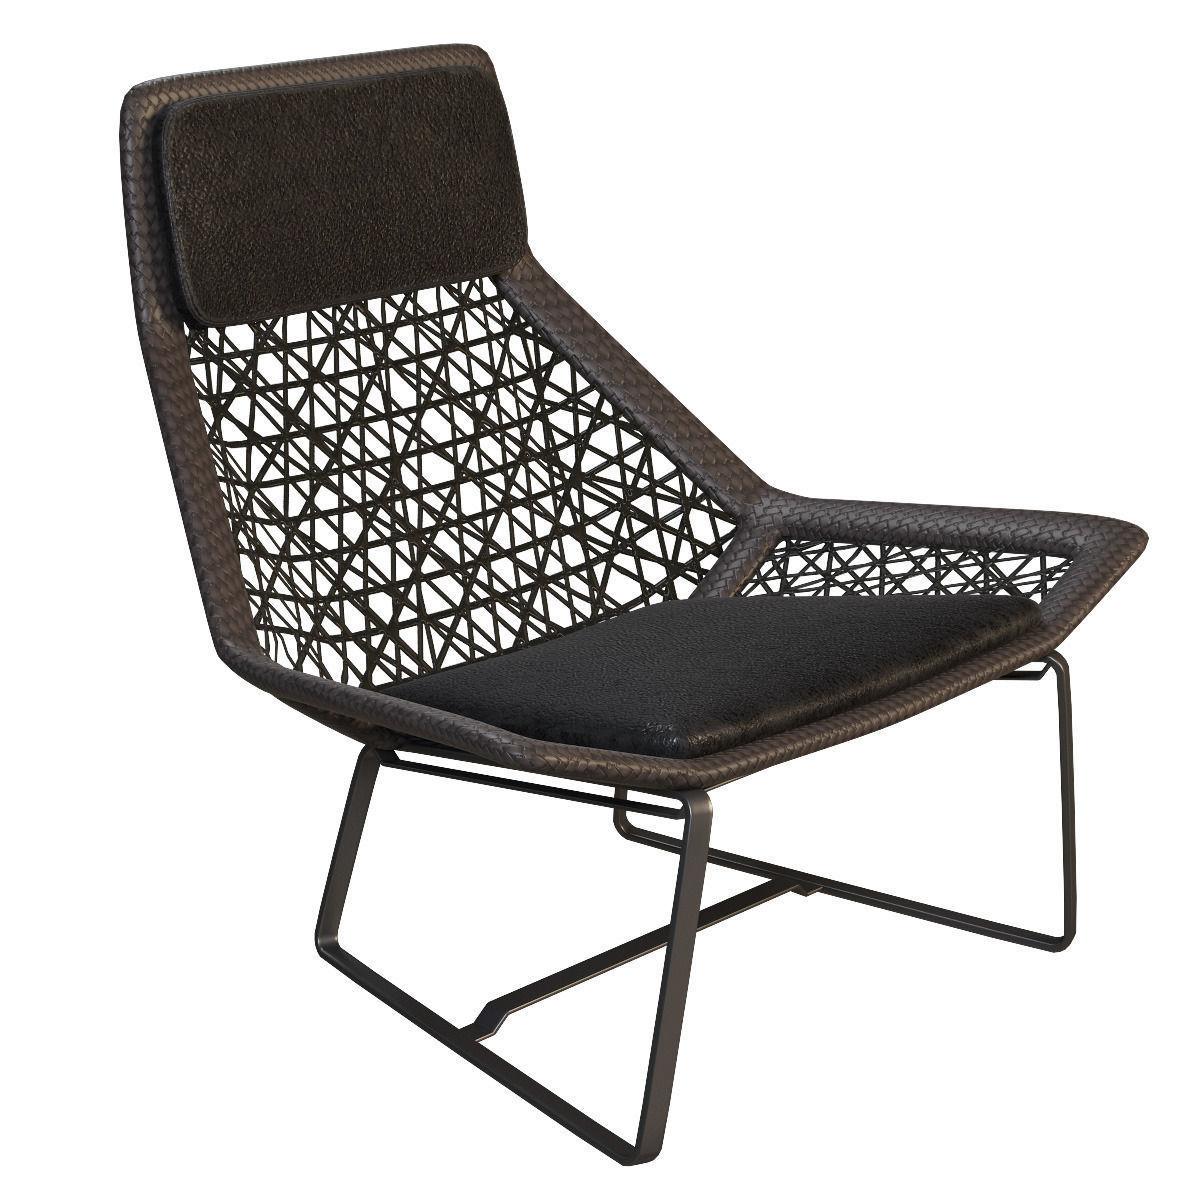 Outdoor Wicker Chair Maia Of Kettal 3d Model Max Obj Mtl 3ds Fbx 1 ...